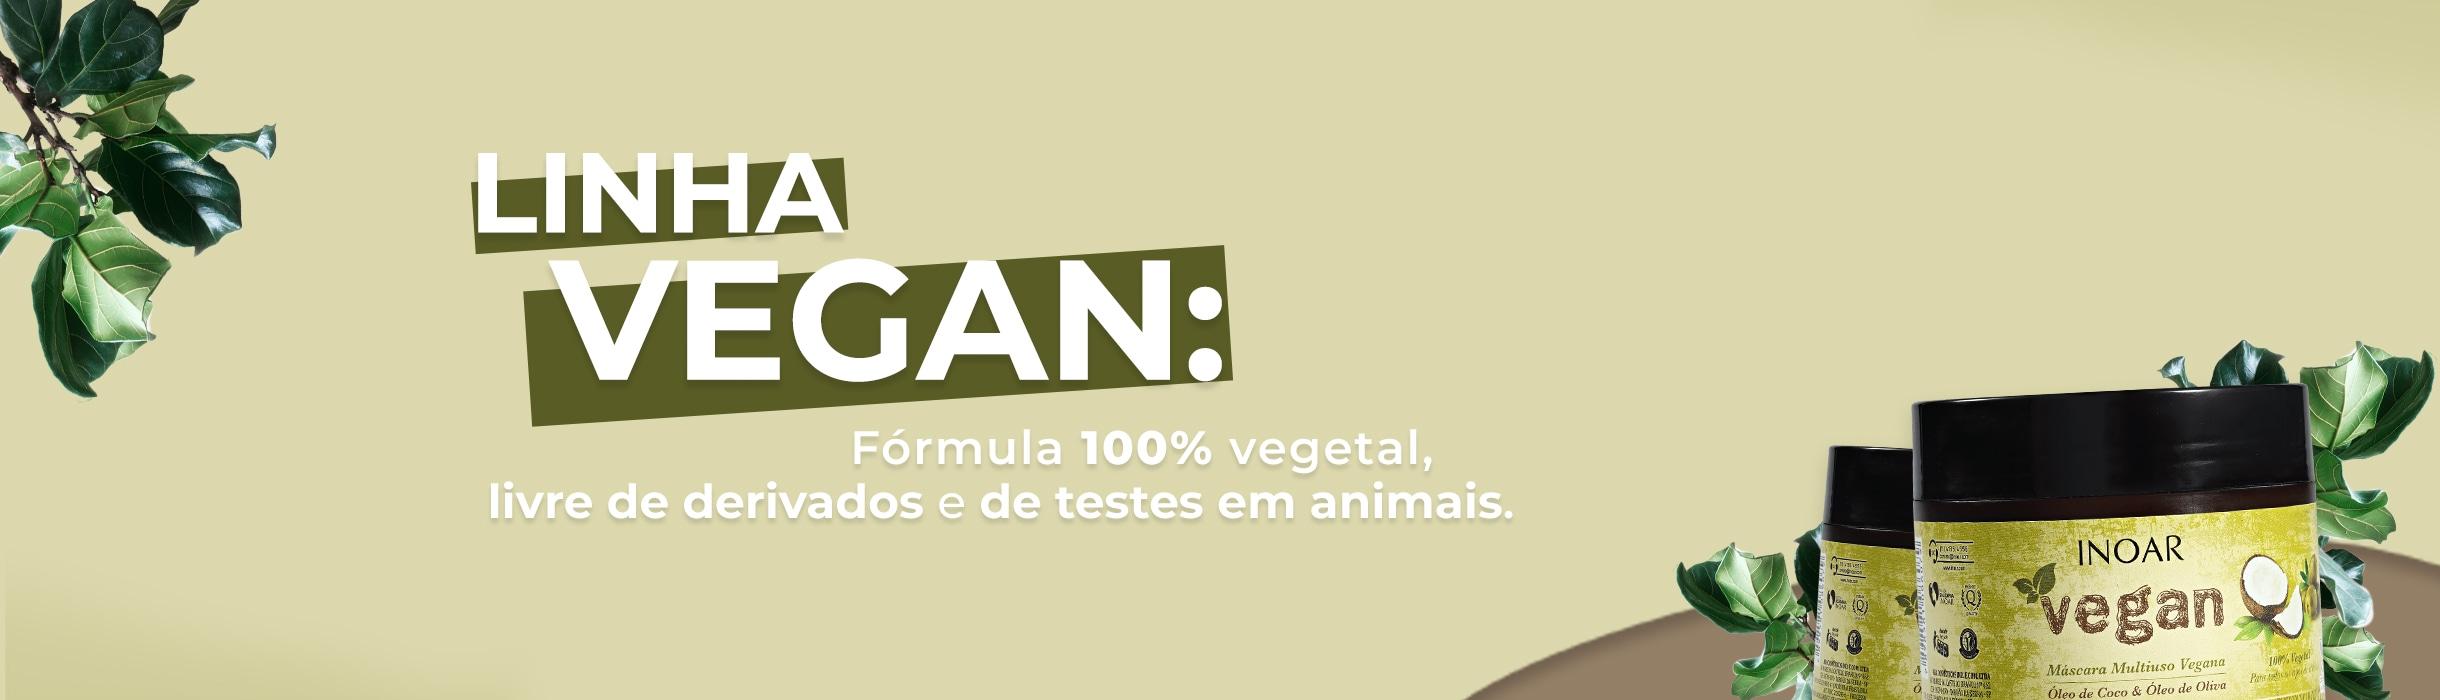 Linha Vegan Inoar